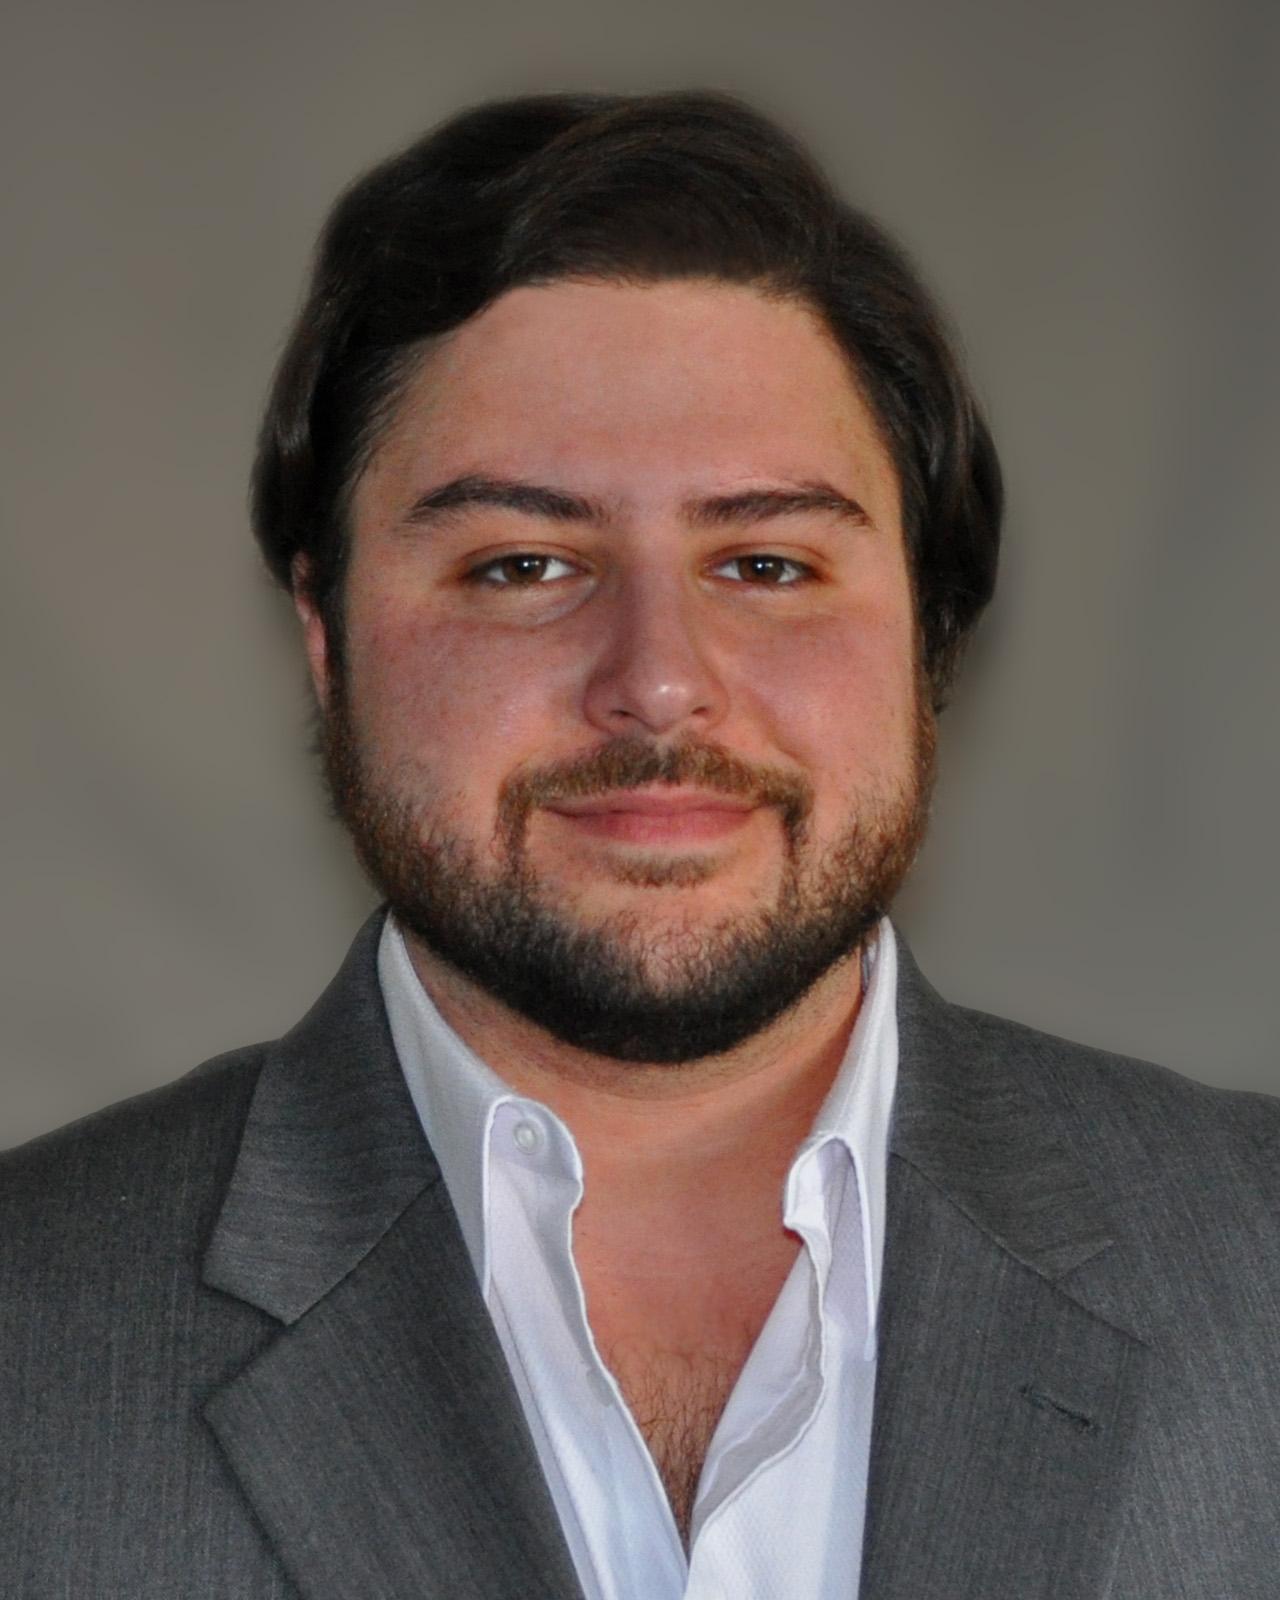 James Shkolnik